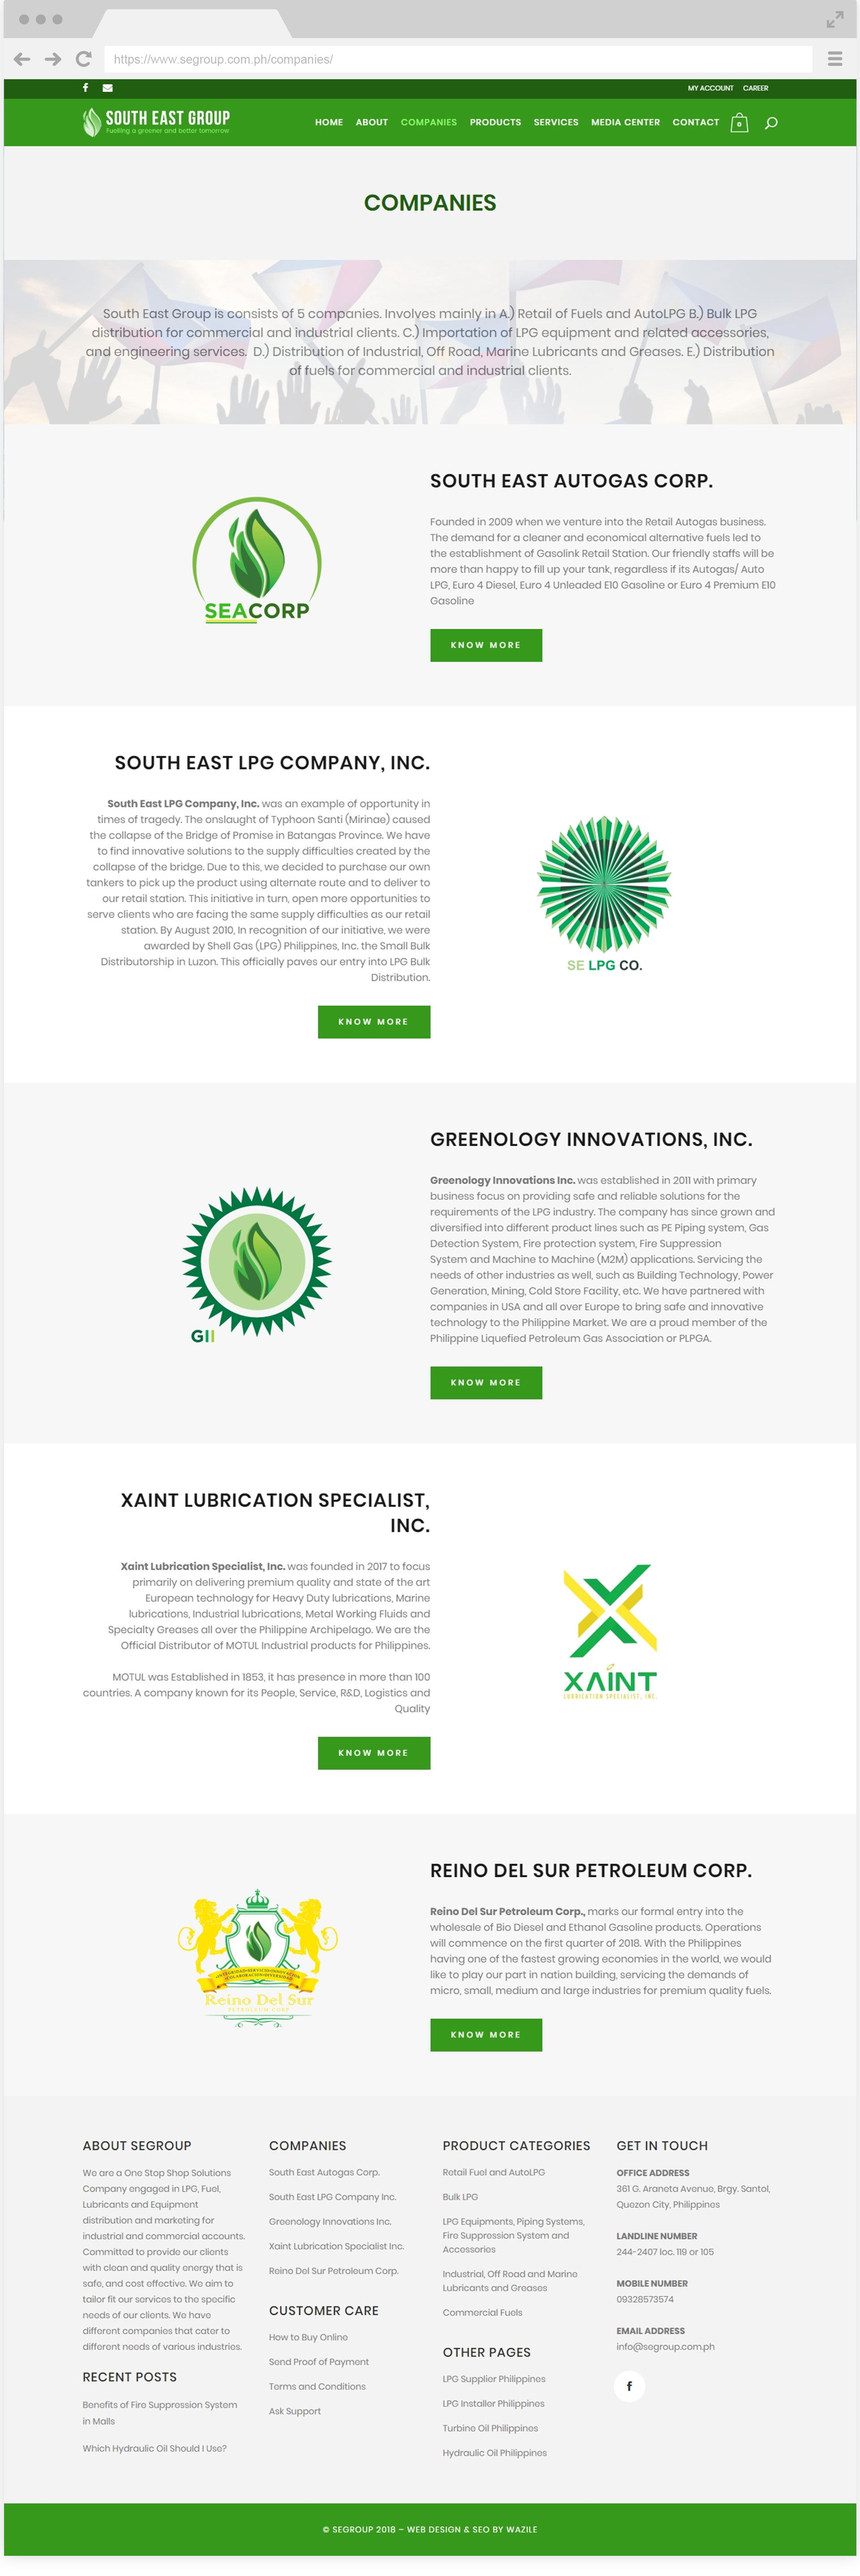 South East Group Companies